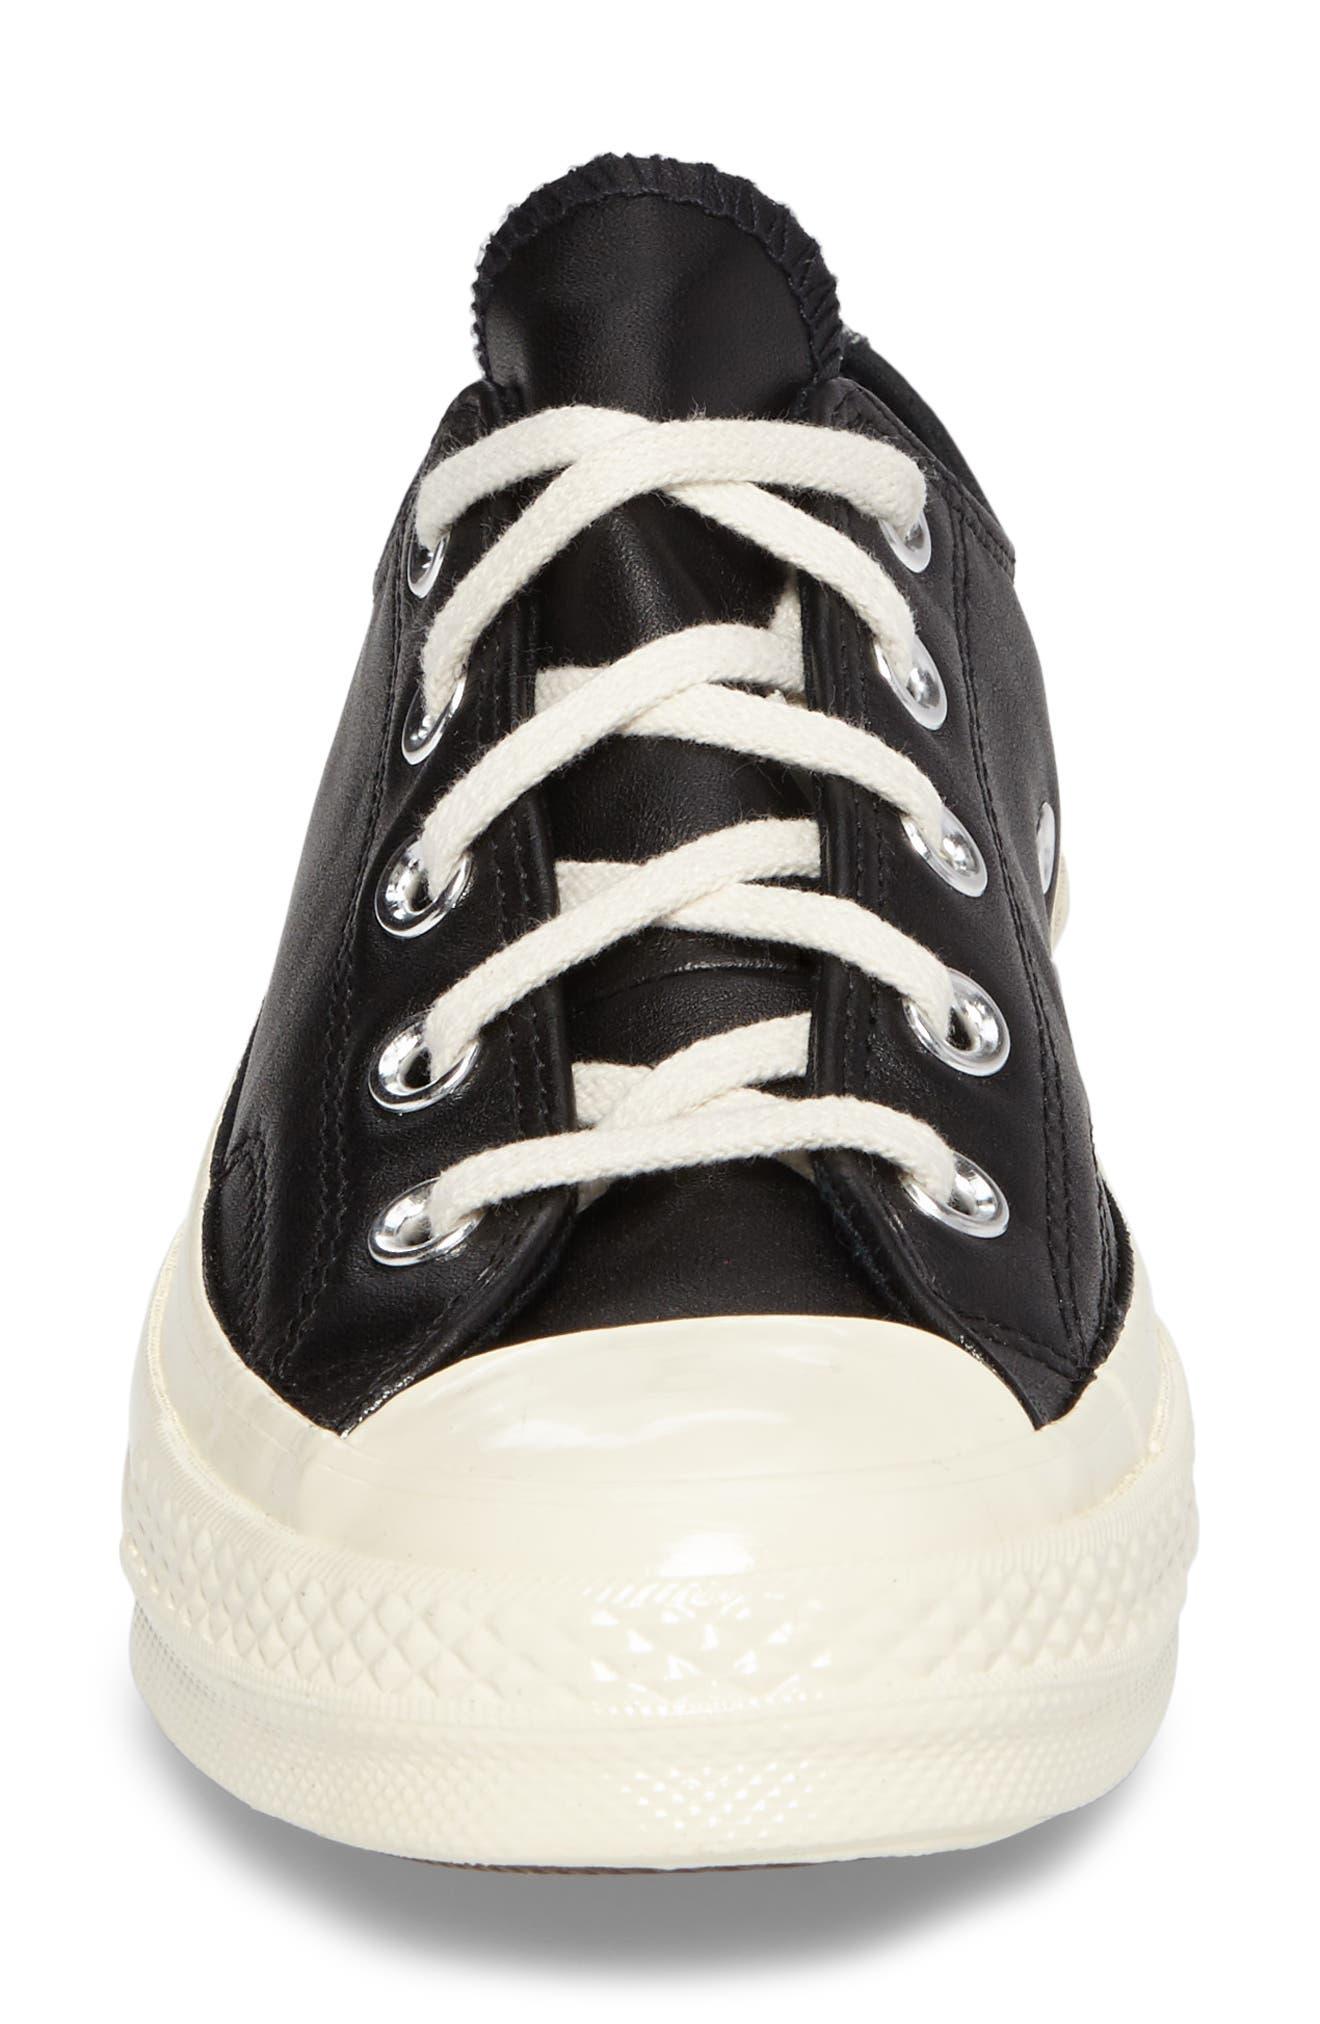 Chuck Taylor<sup>®</sup> All Star<sup>®</sup> Ox Genuine Calf Hair Sneaker,                             Alternate thumbnail 4, color,                             001